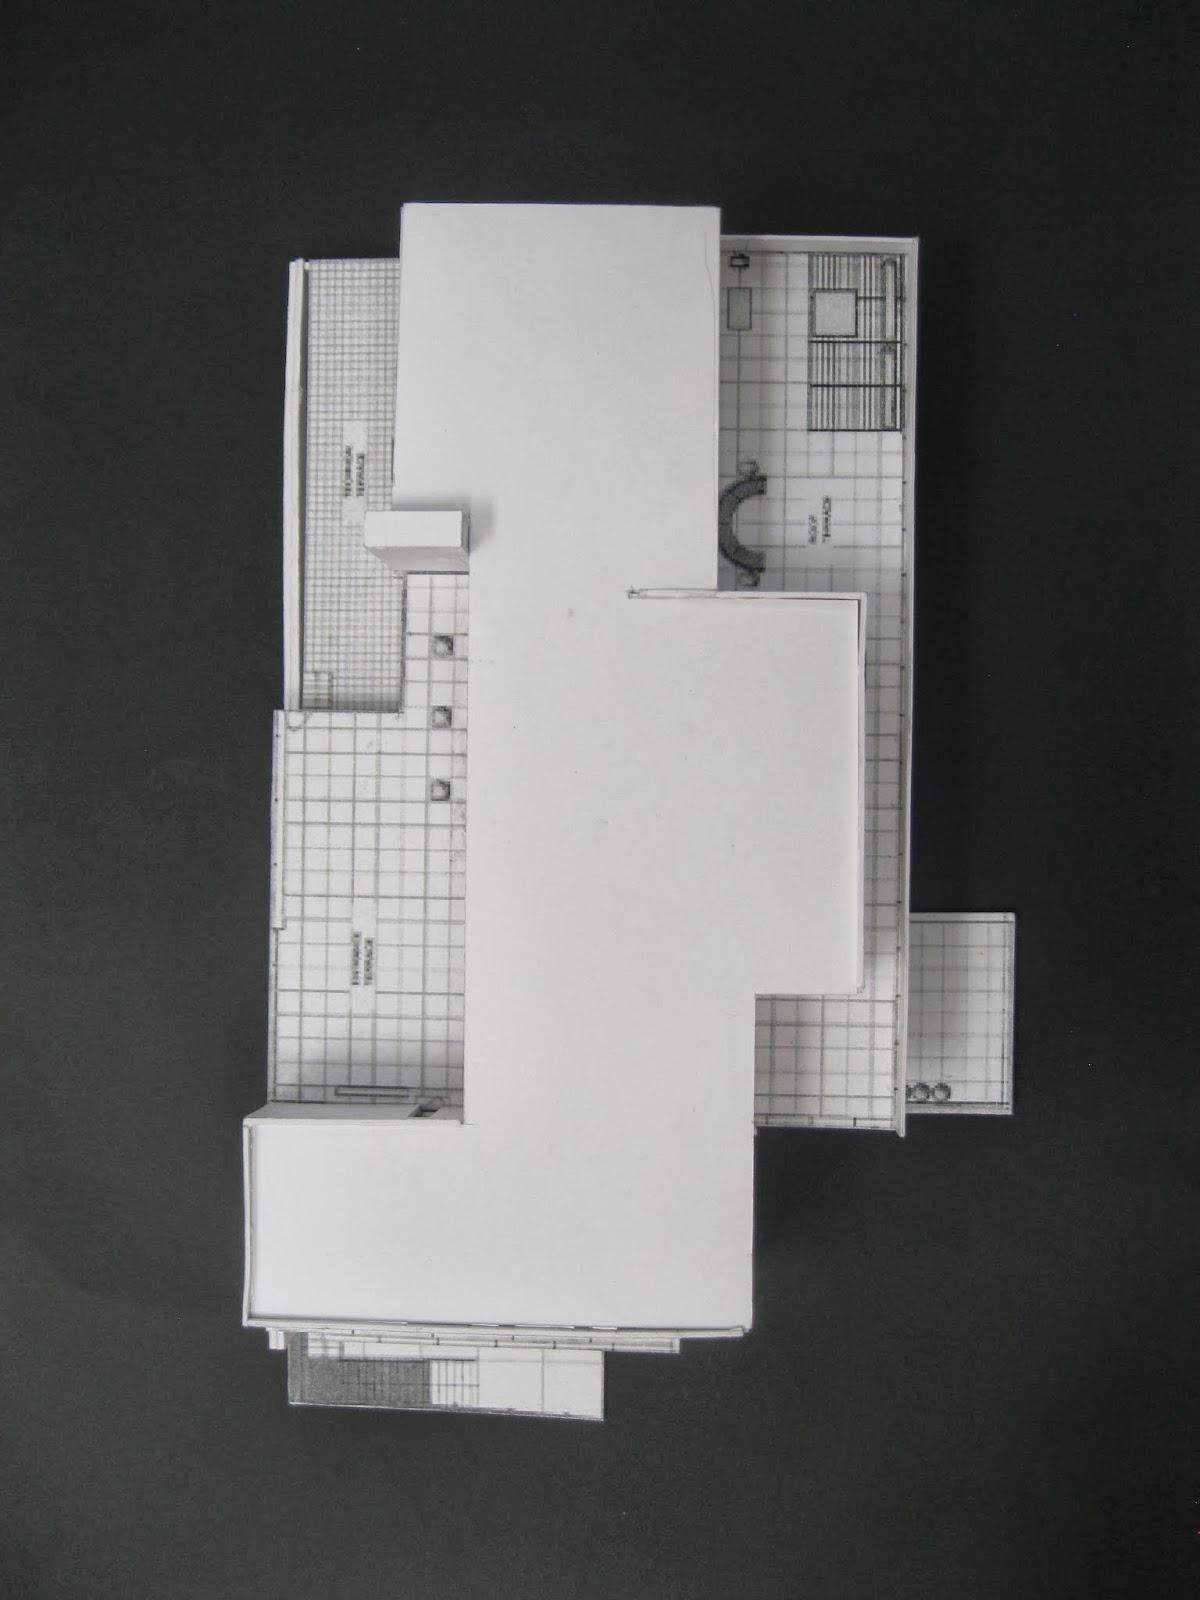 Historia de la arquitectura moderna villa tugendhat for Historia de la arquitectura moderna